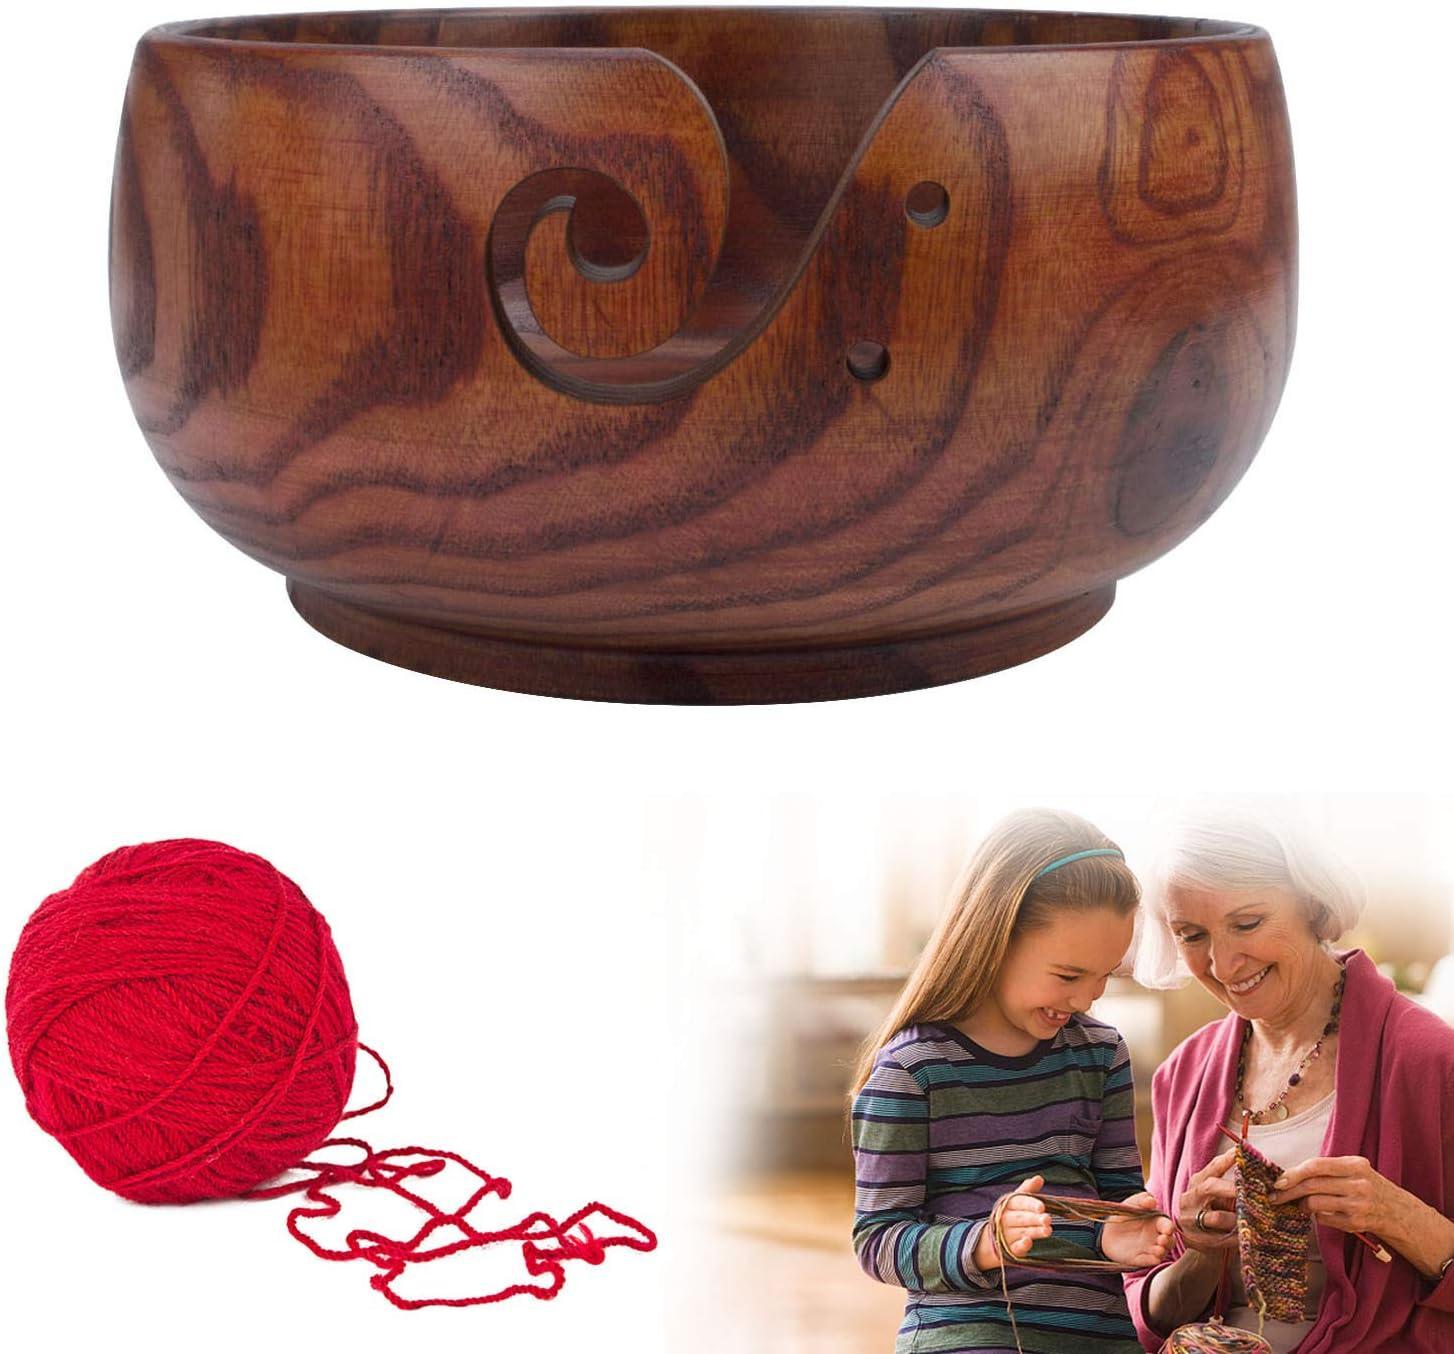 Wooden Yarn Bowl Knitting 2021 Wool with Max 56% OFF Hol Basket Handmade Storage